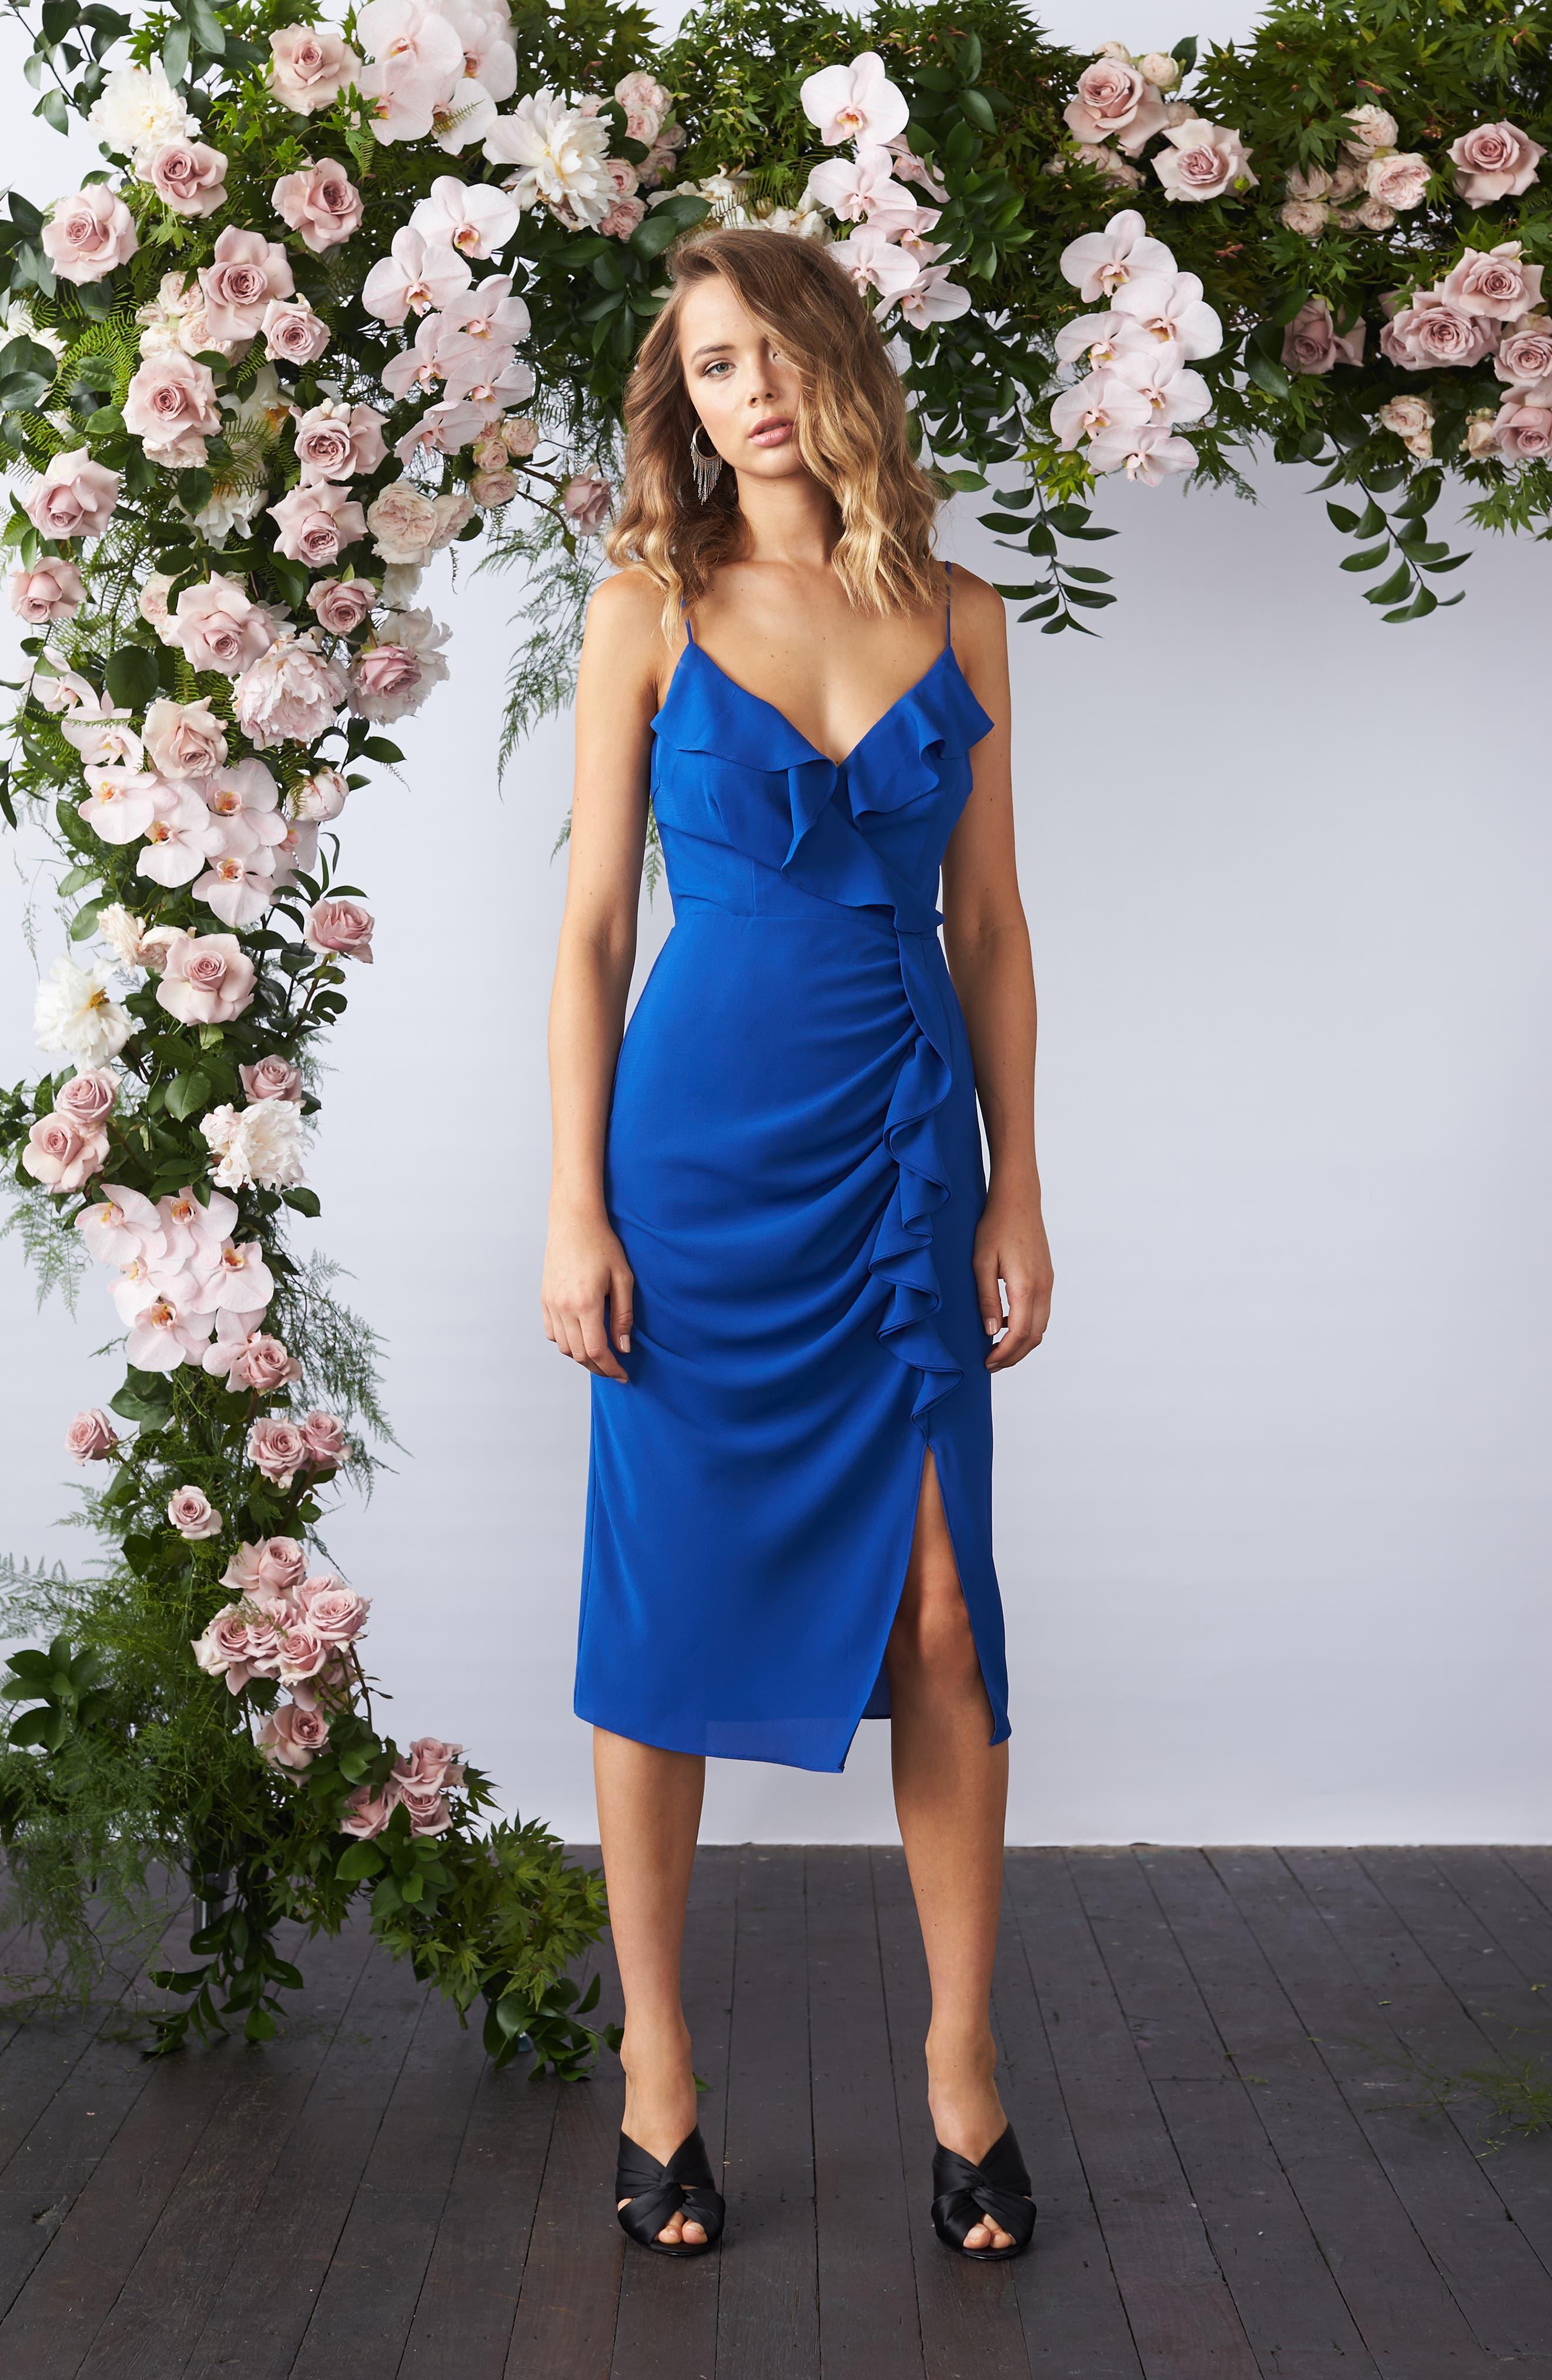 Camilla Frill Sheath Dress,                             Alternate thumbnail 8, color,                             460